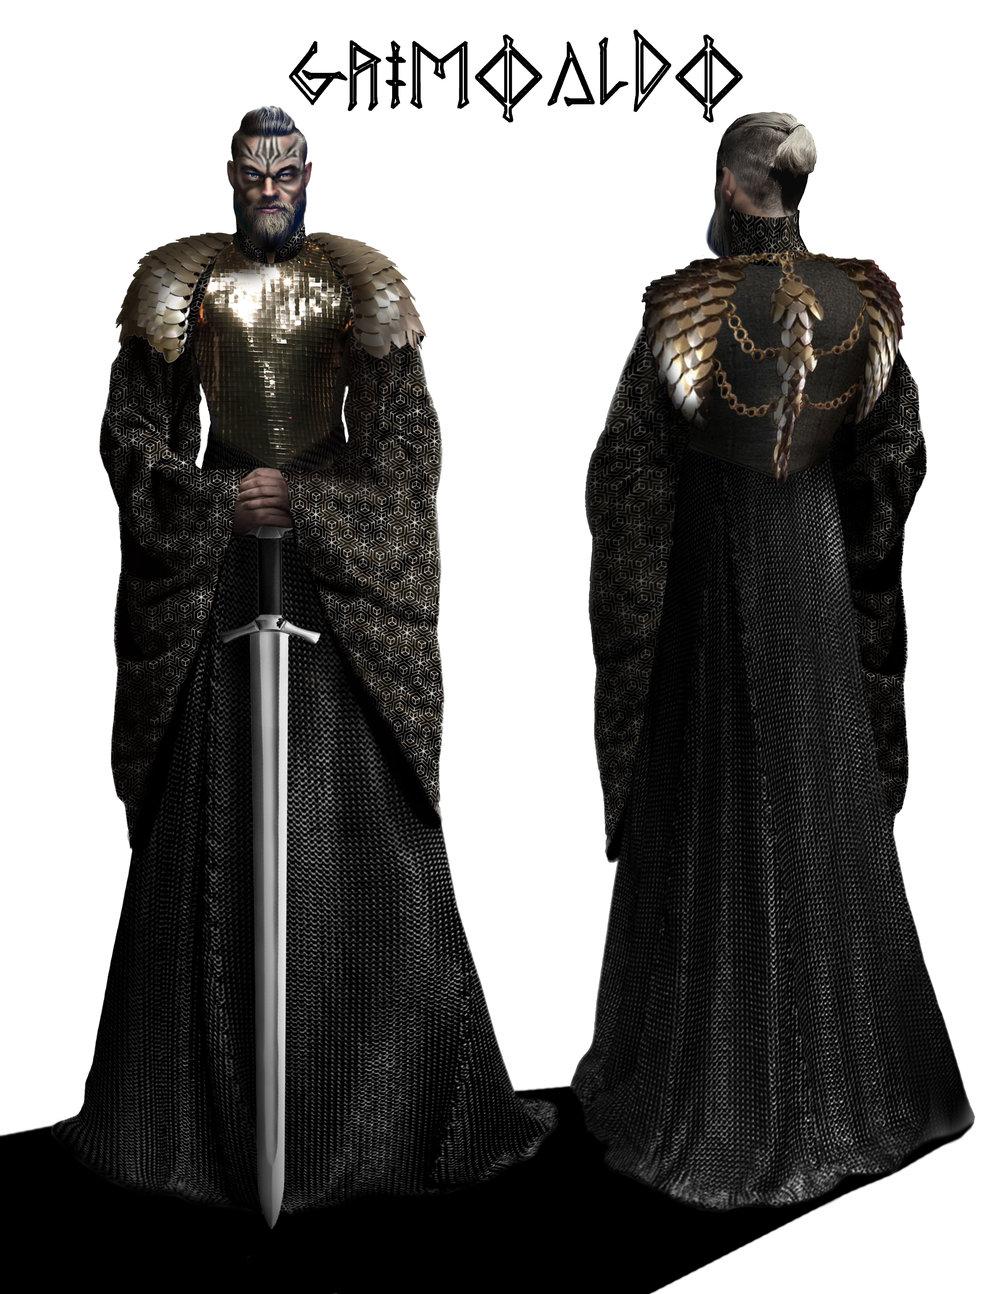 GRIMOALDO - Costume Design